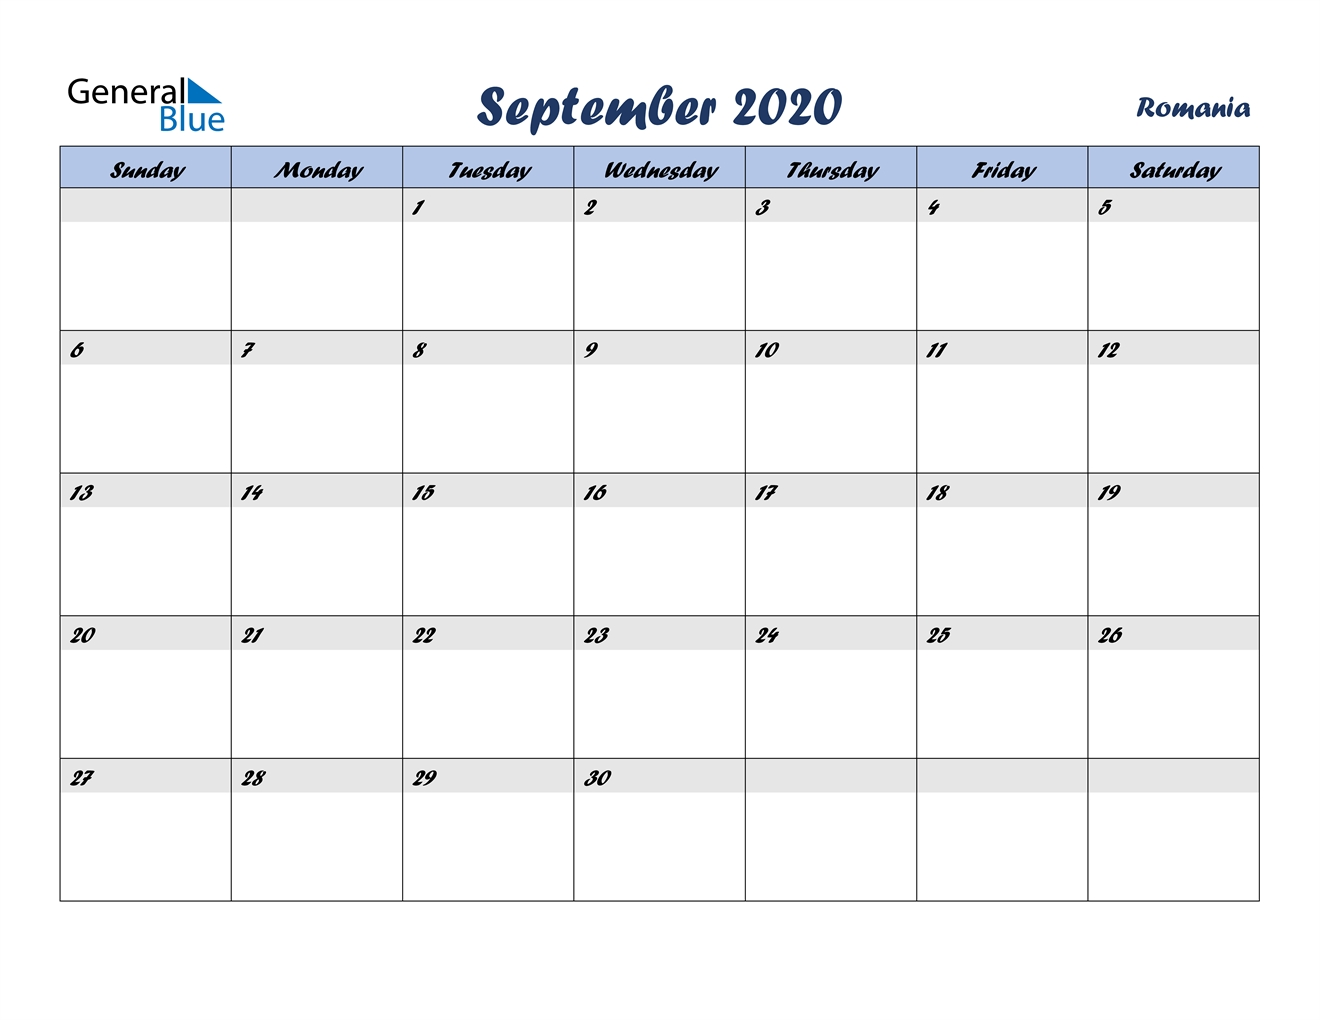 September 2020 Calendar - Romania